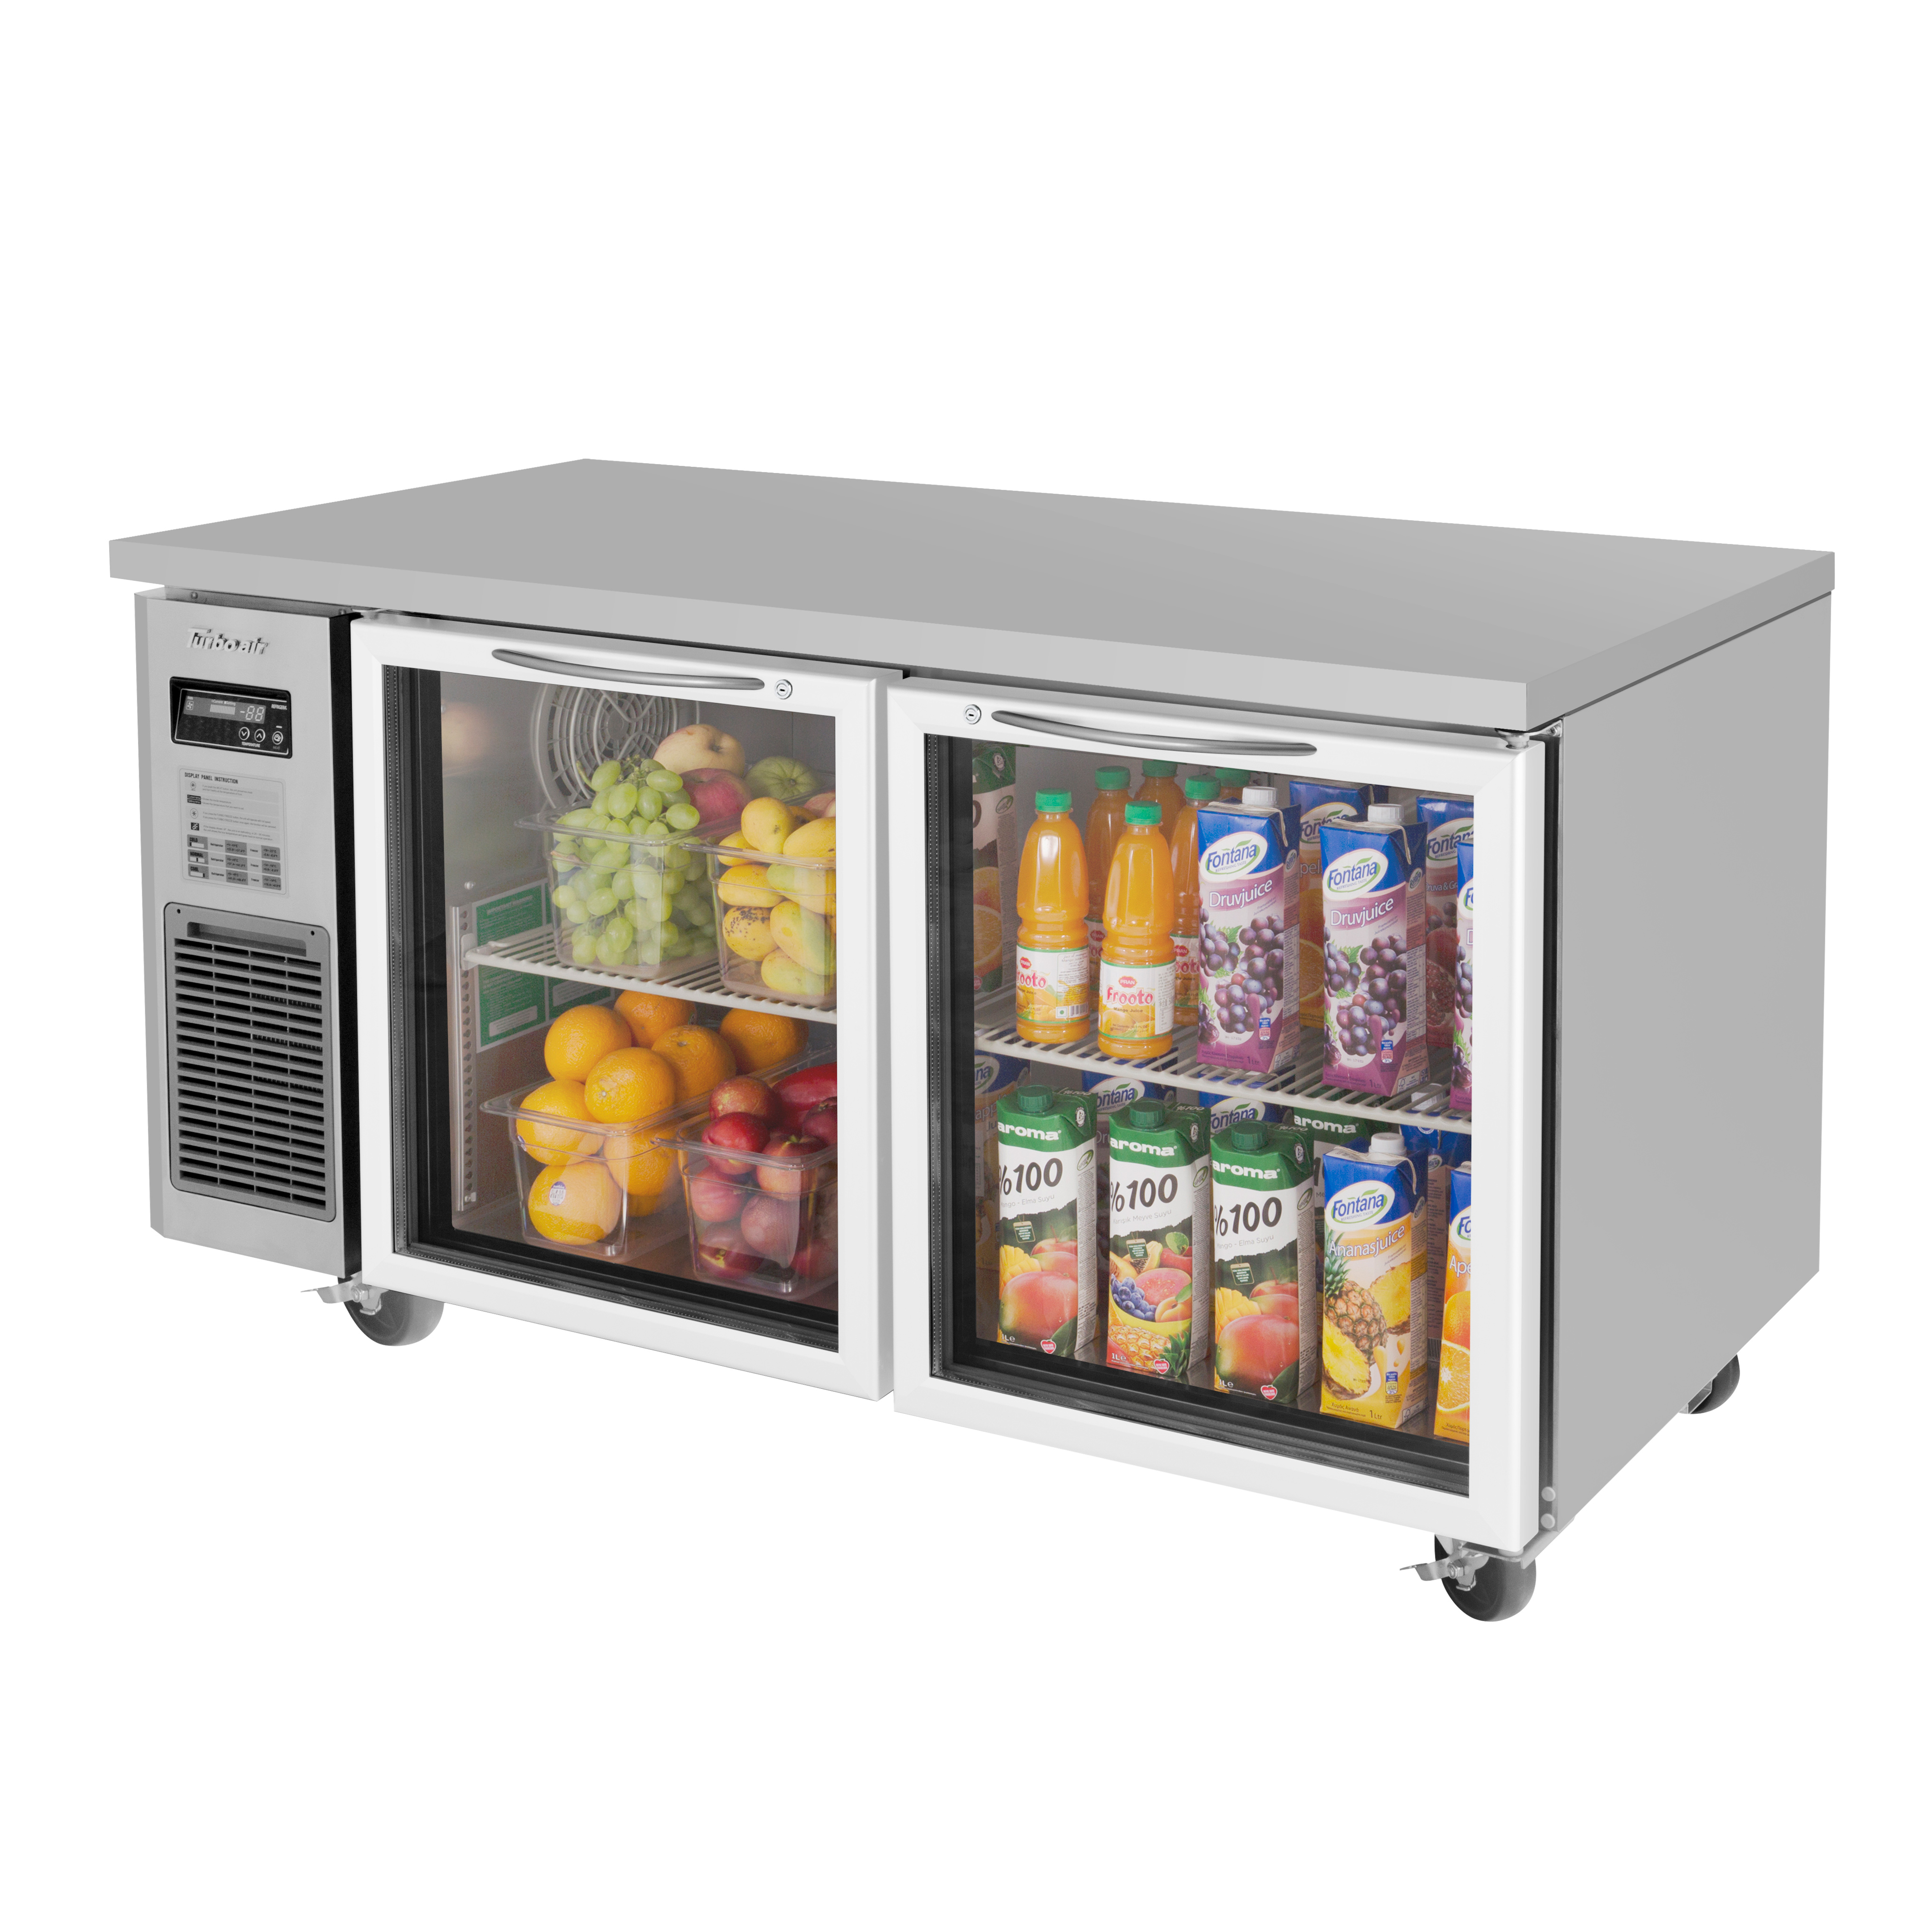 Turbo Air JUR-60-G-N refrigerator, undercounter, reach-in